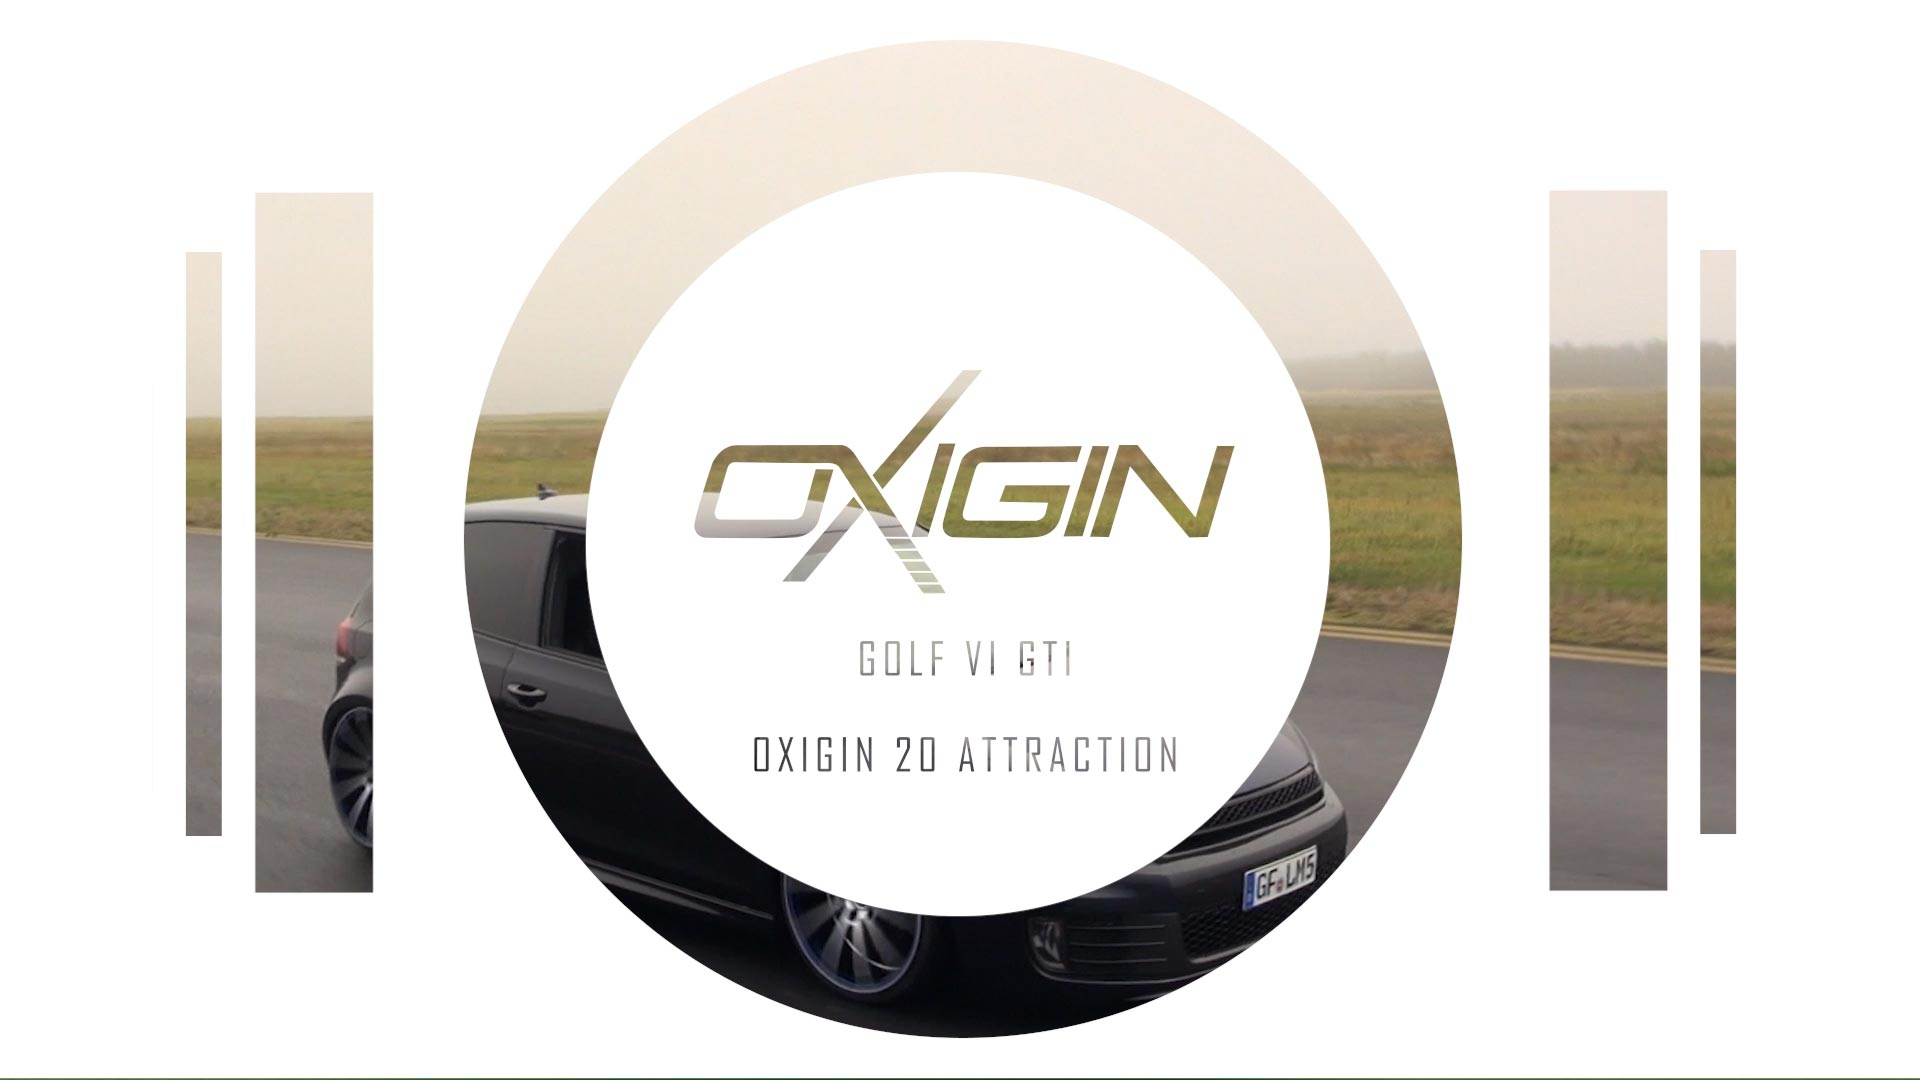 VW Golf VI OX20 Attraction Folie Blau v2